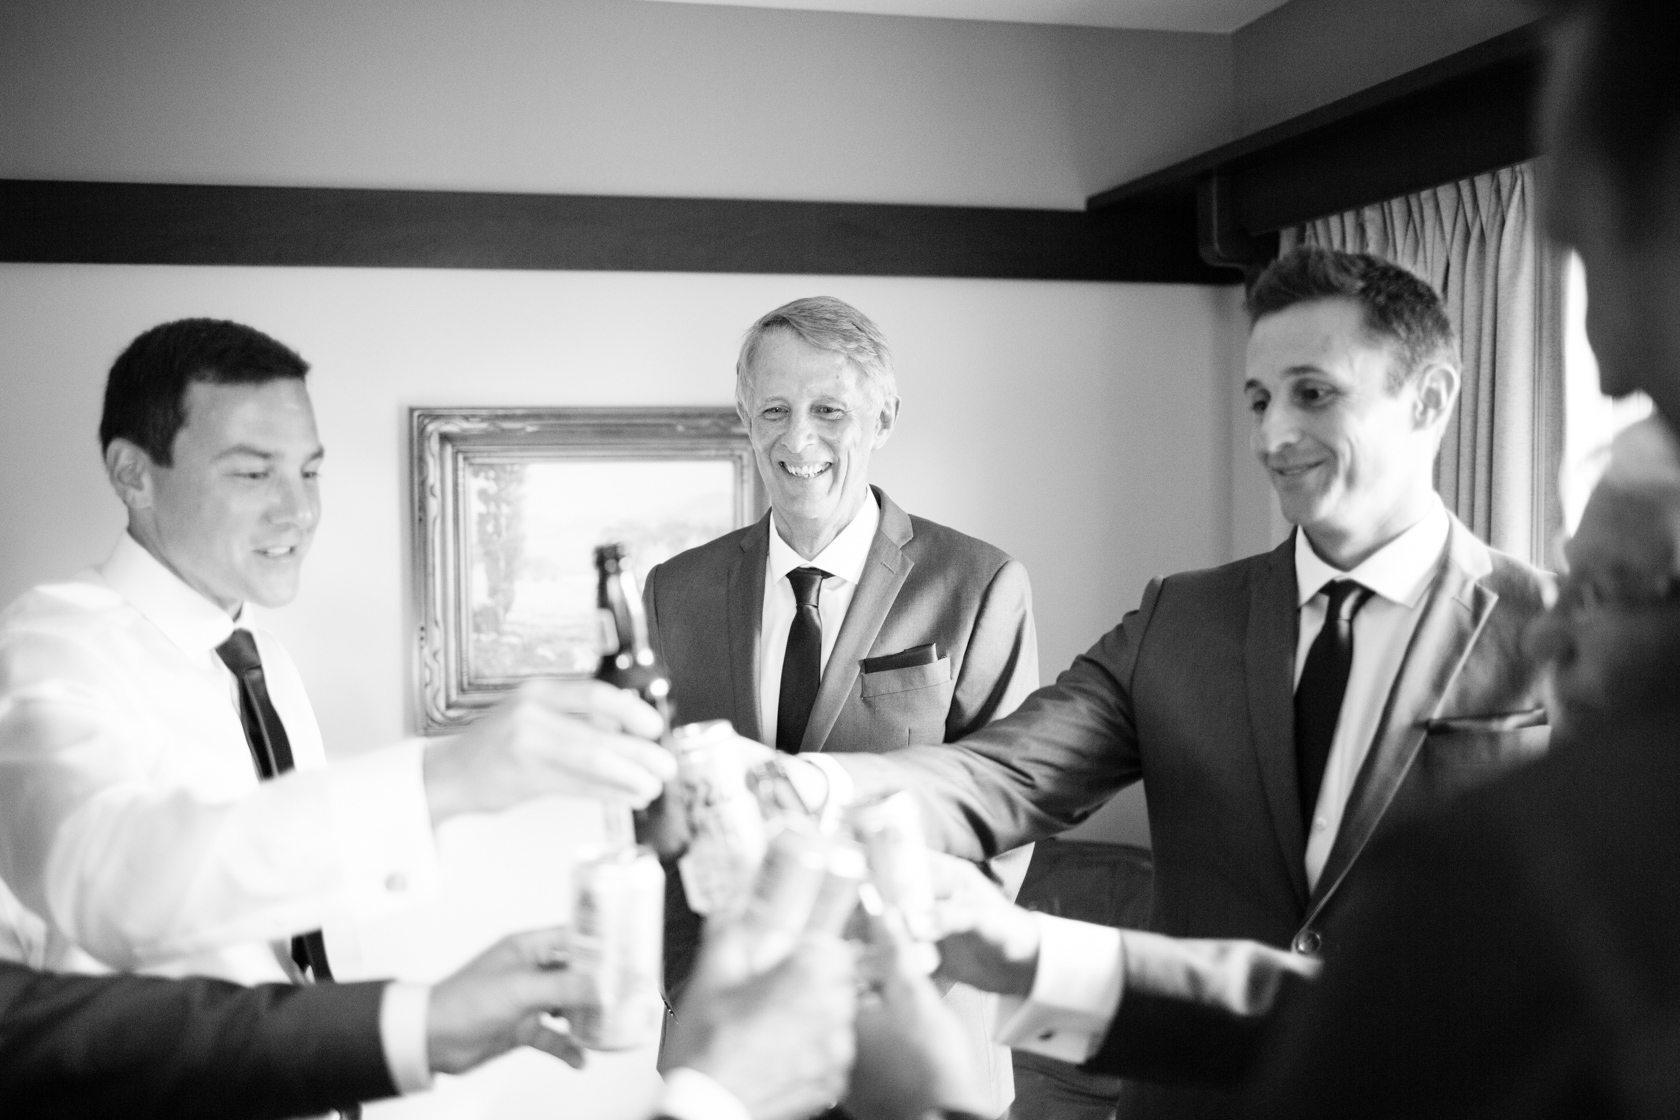 The_Lodge_at_Torrey_Pines_Wedding_027.jpg